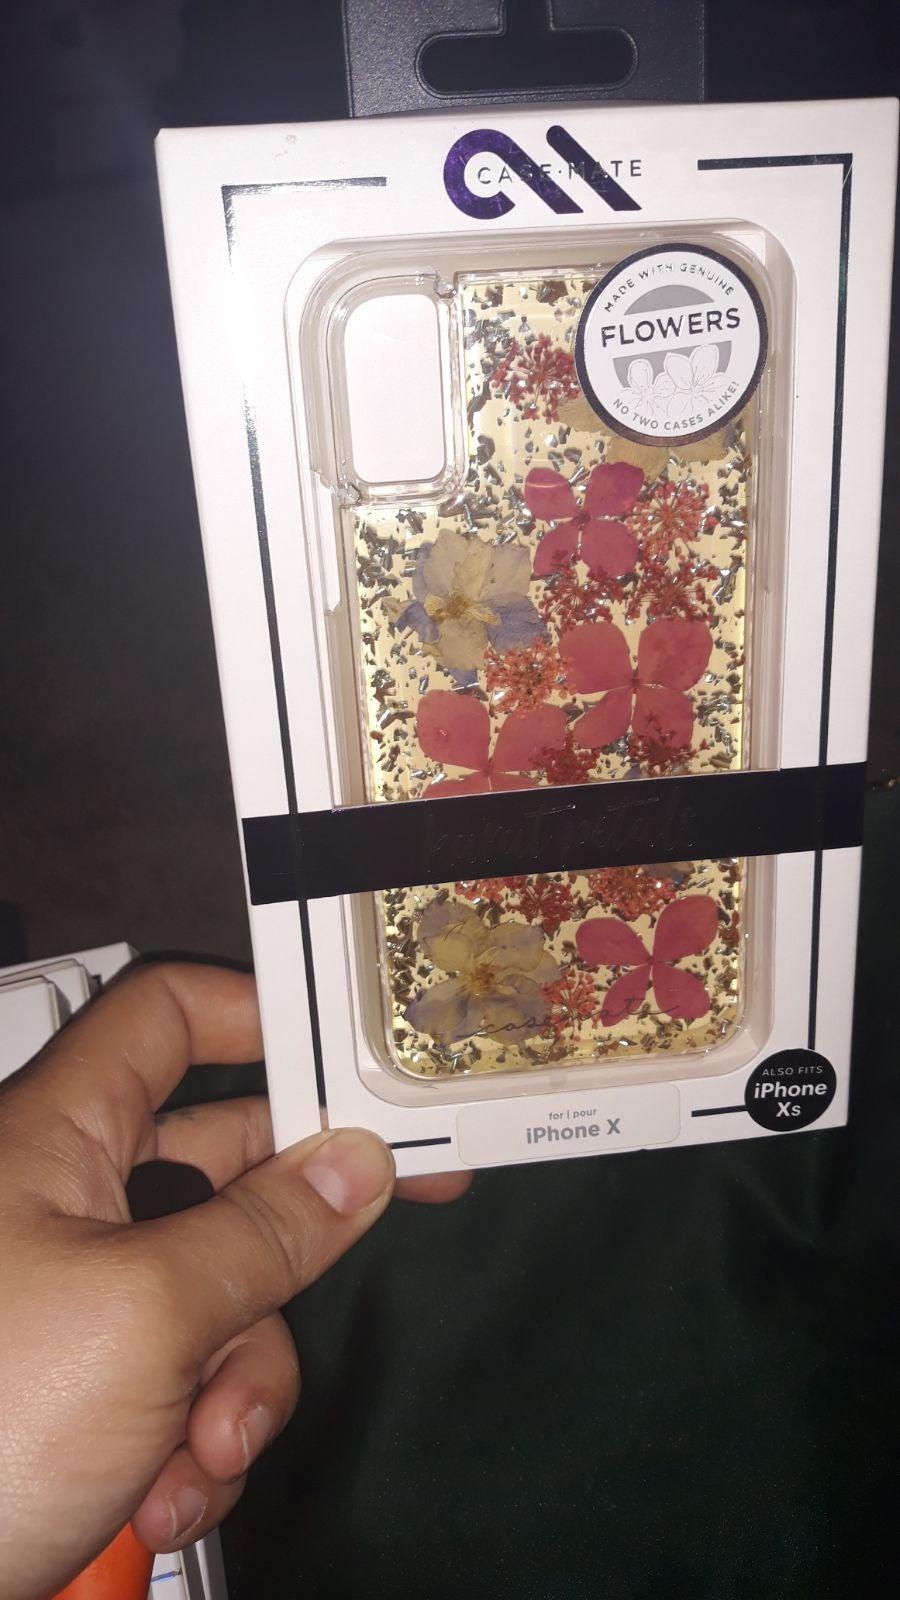 Floral Iphone x/xs casemate case